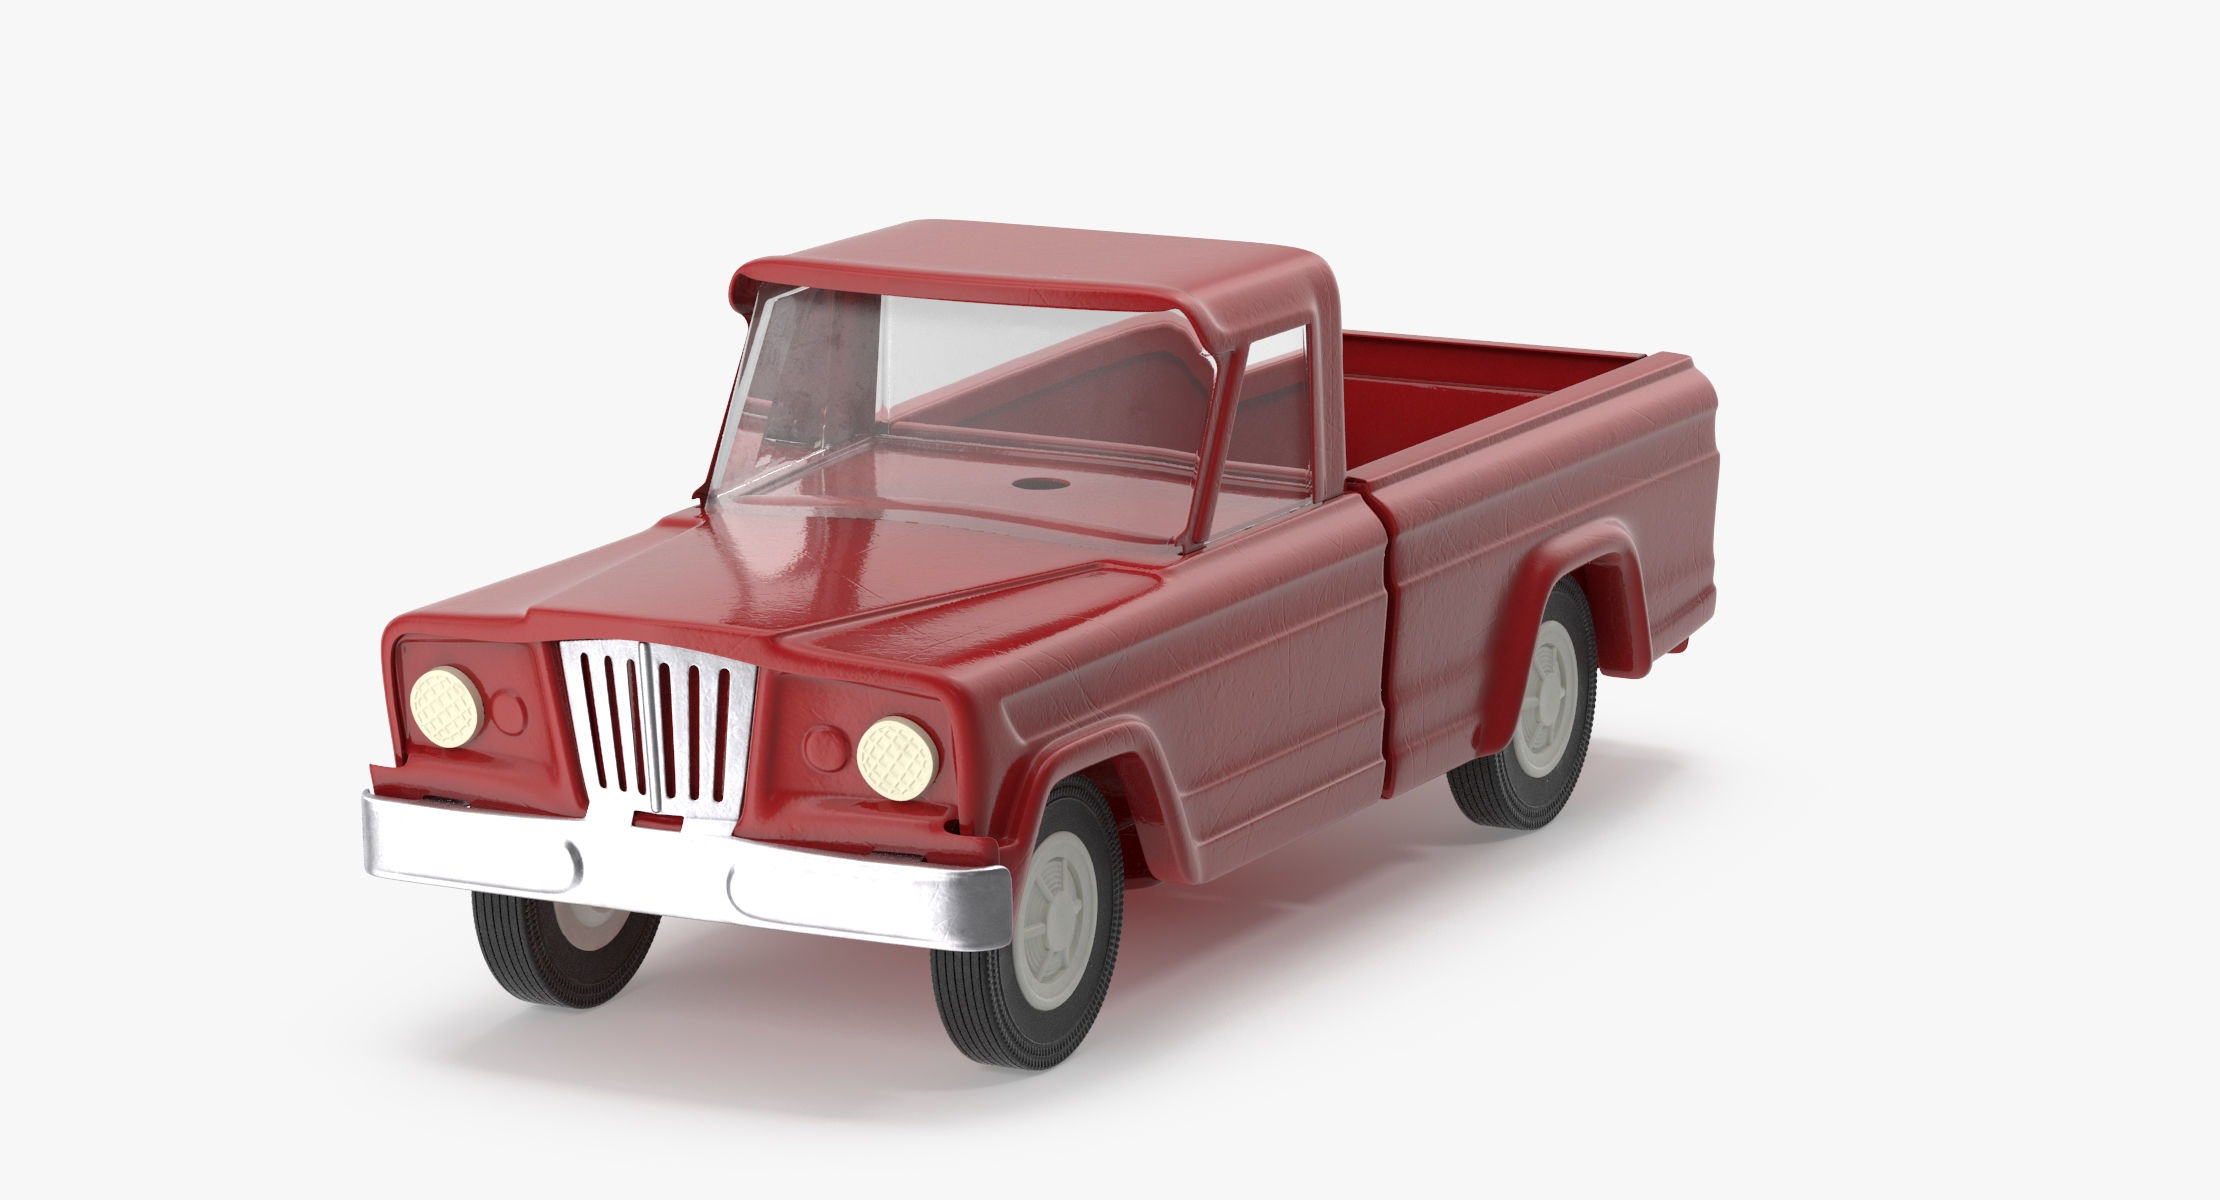 Toy Truck 02 - reel 1